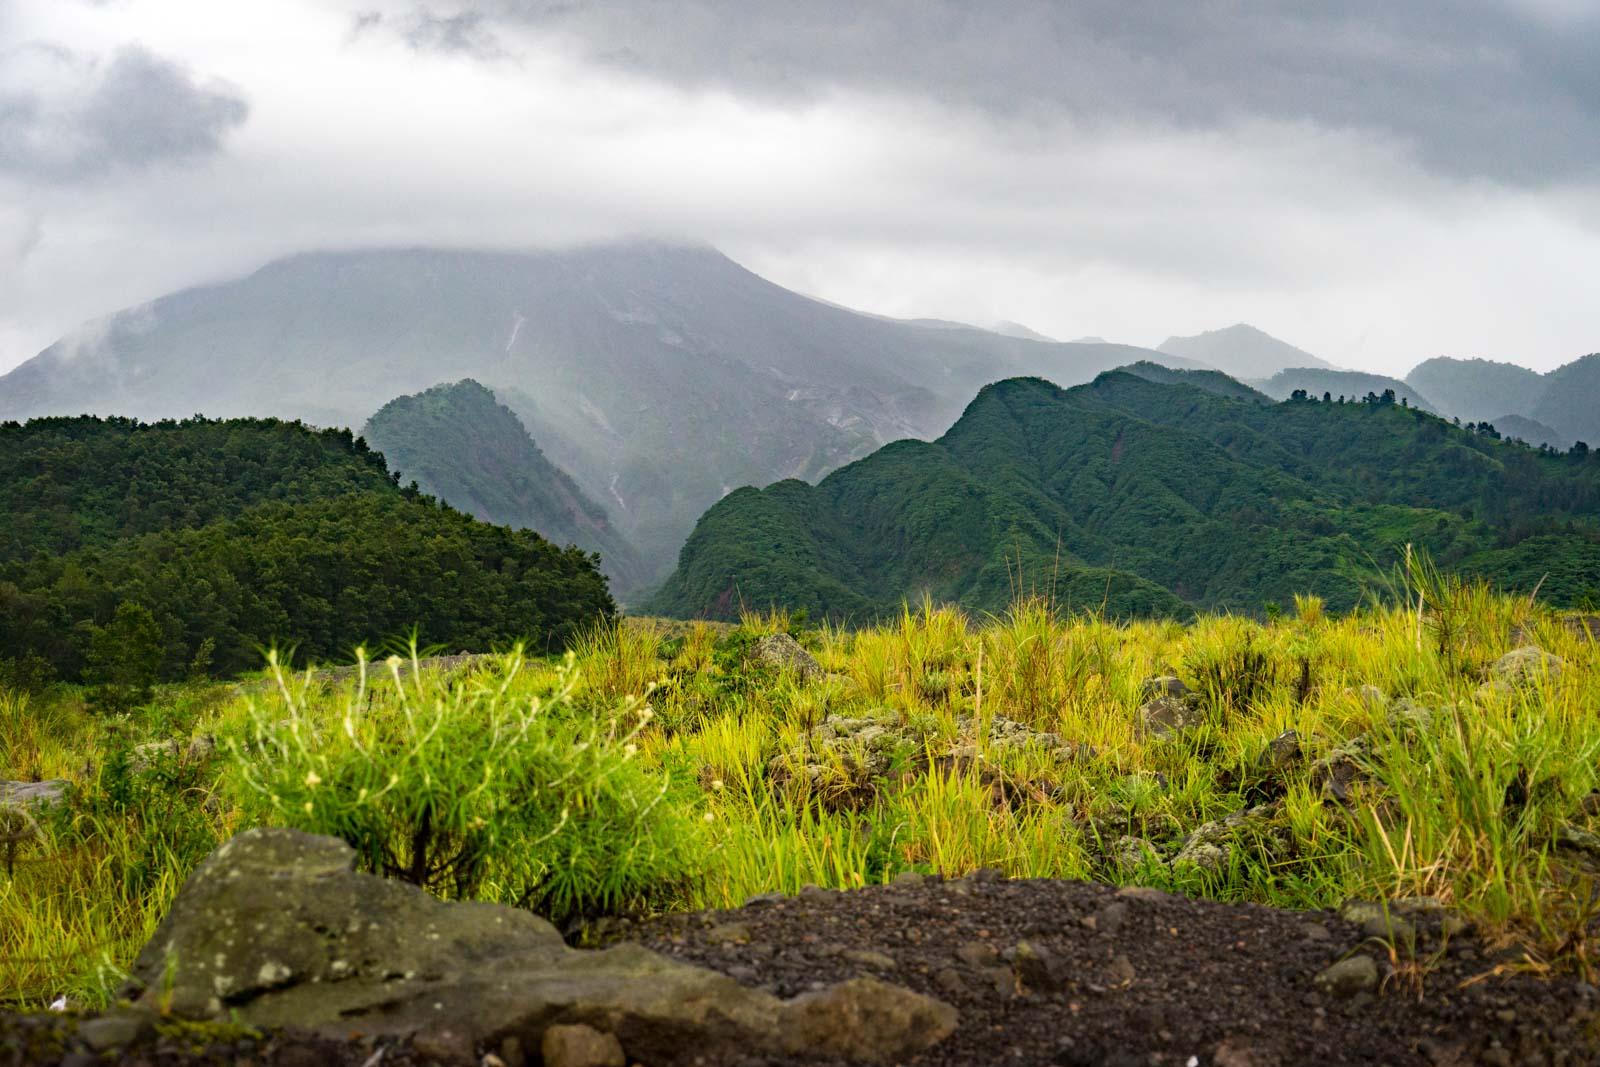 Mount Merapi jeep tour, Indonesia